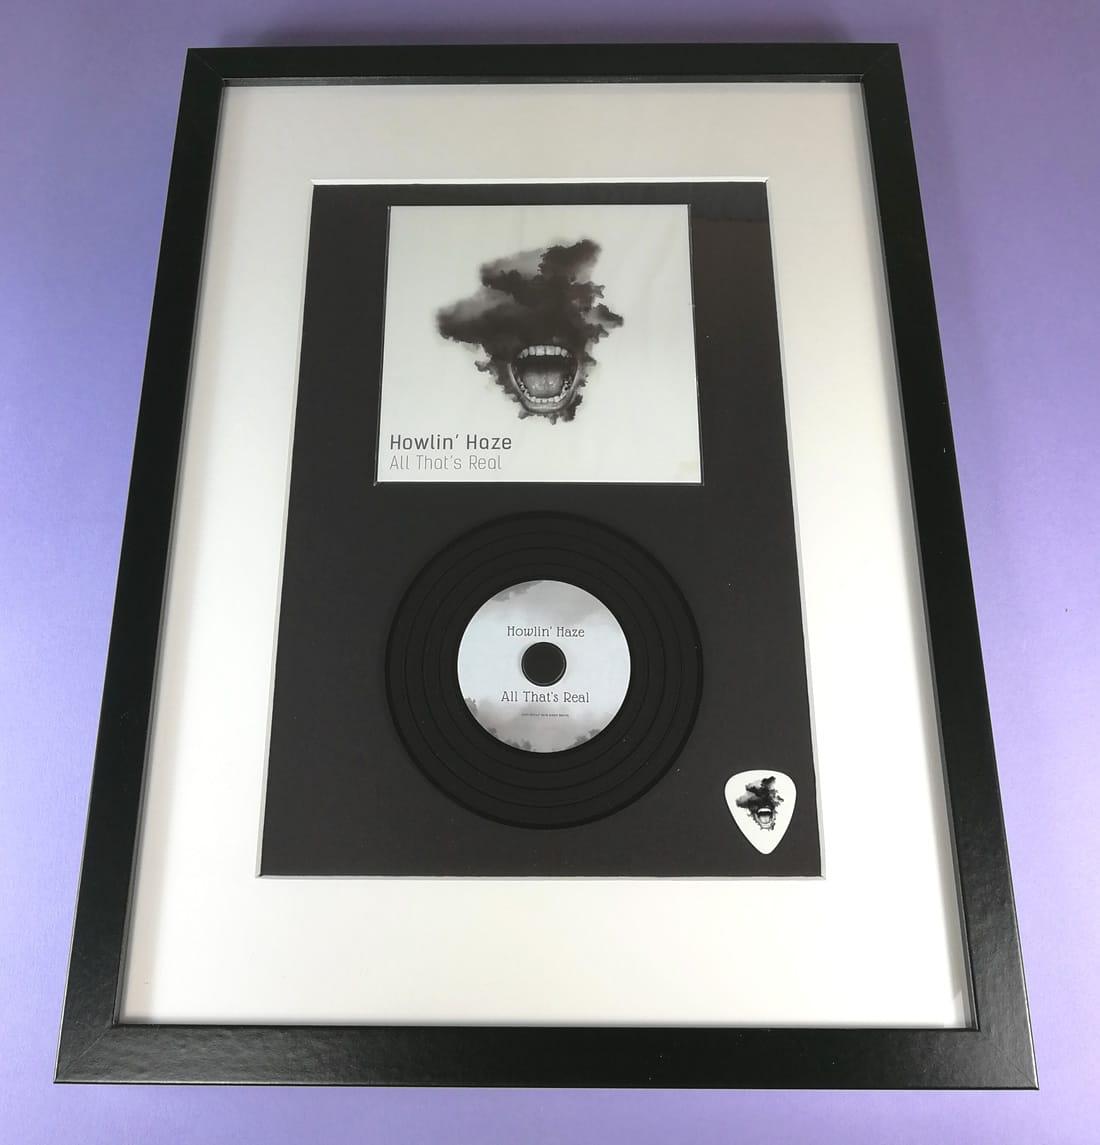 Black presentation frames with vinyl CD and custom guitar pick